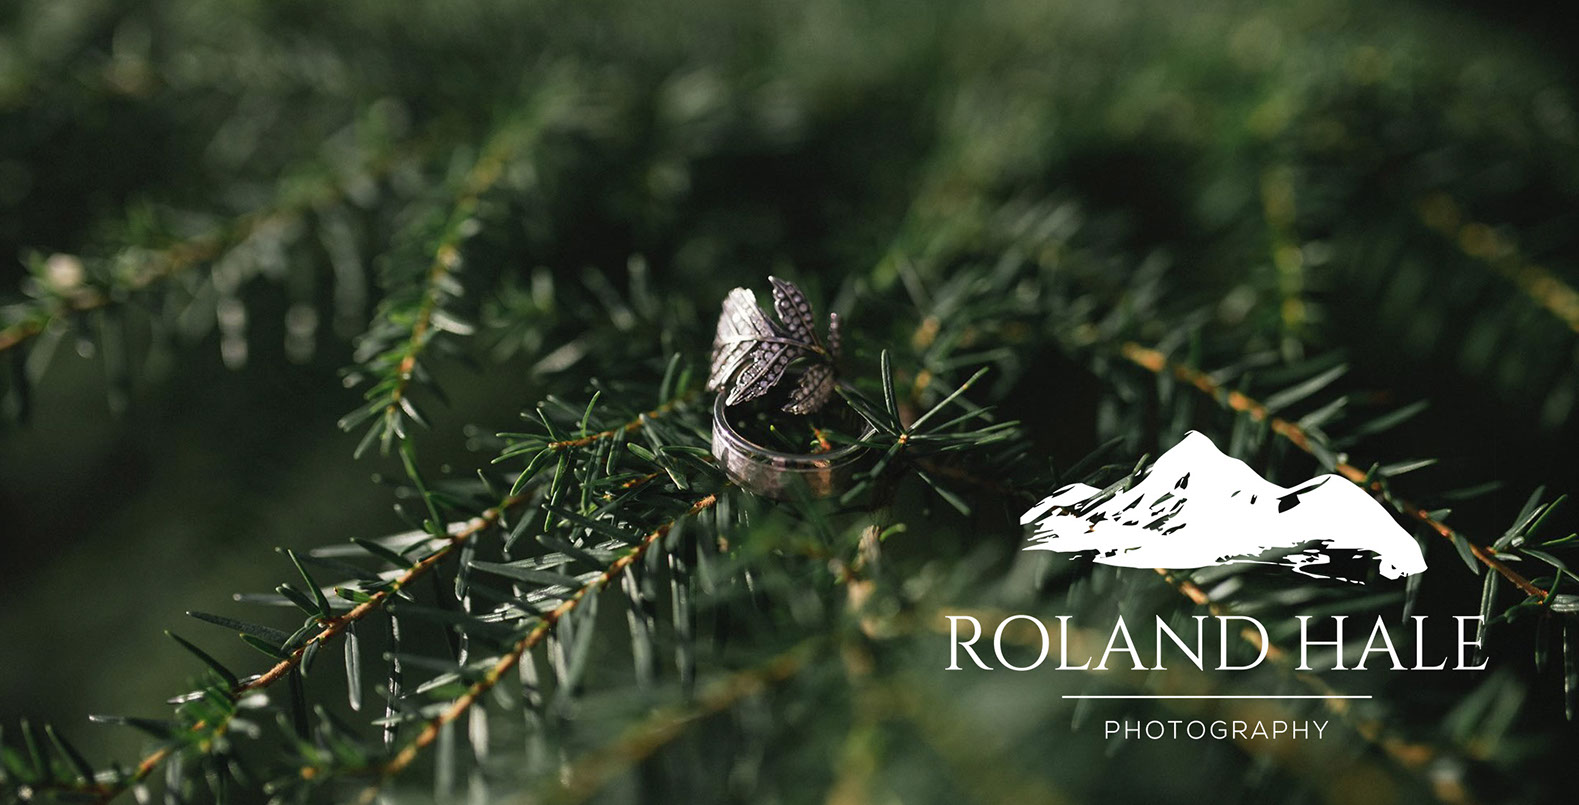 Roland Hale photography logo